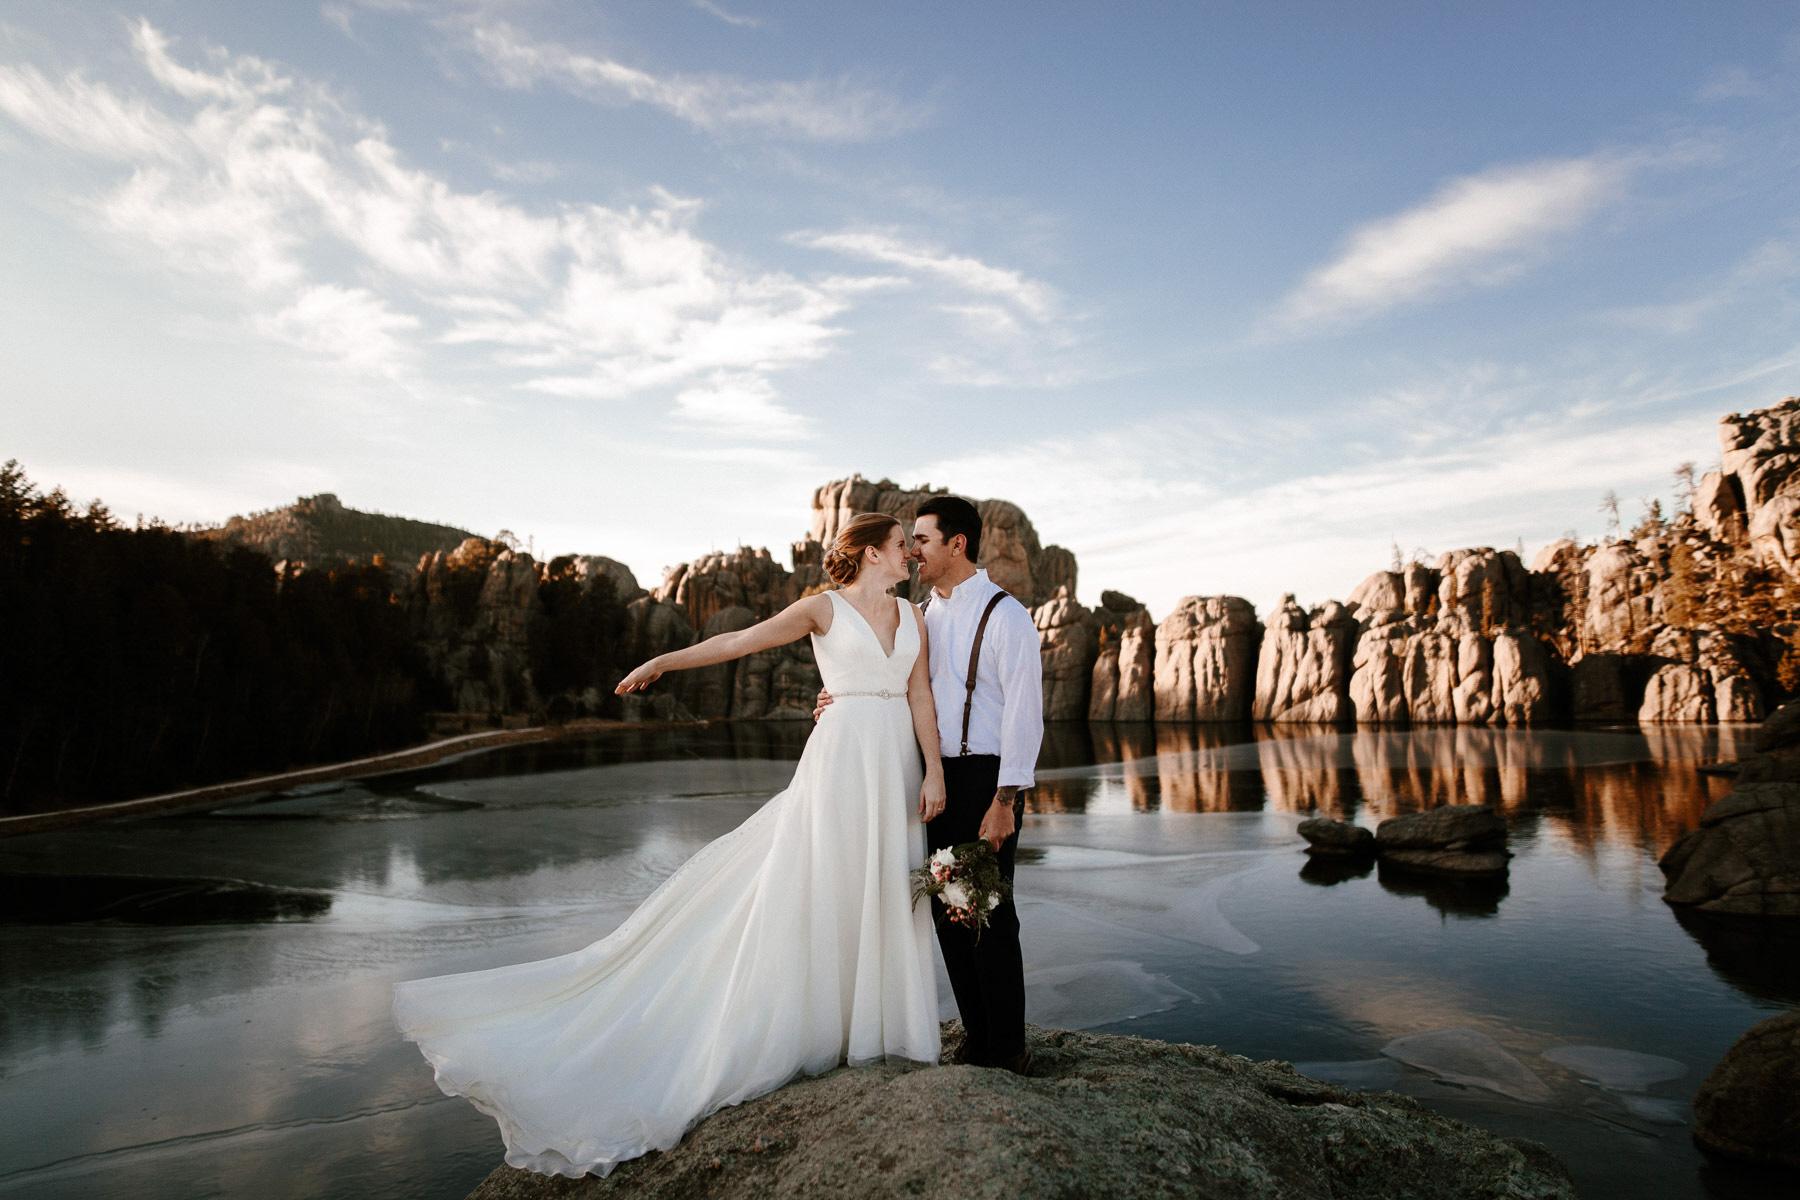 sioux-falls-black-hills-rapid-city-elopement-wedding-adventure-photographer-custer-sylvan-lake-33.jpg